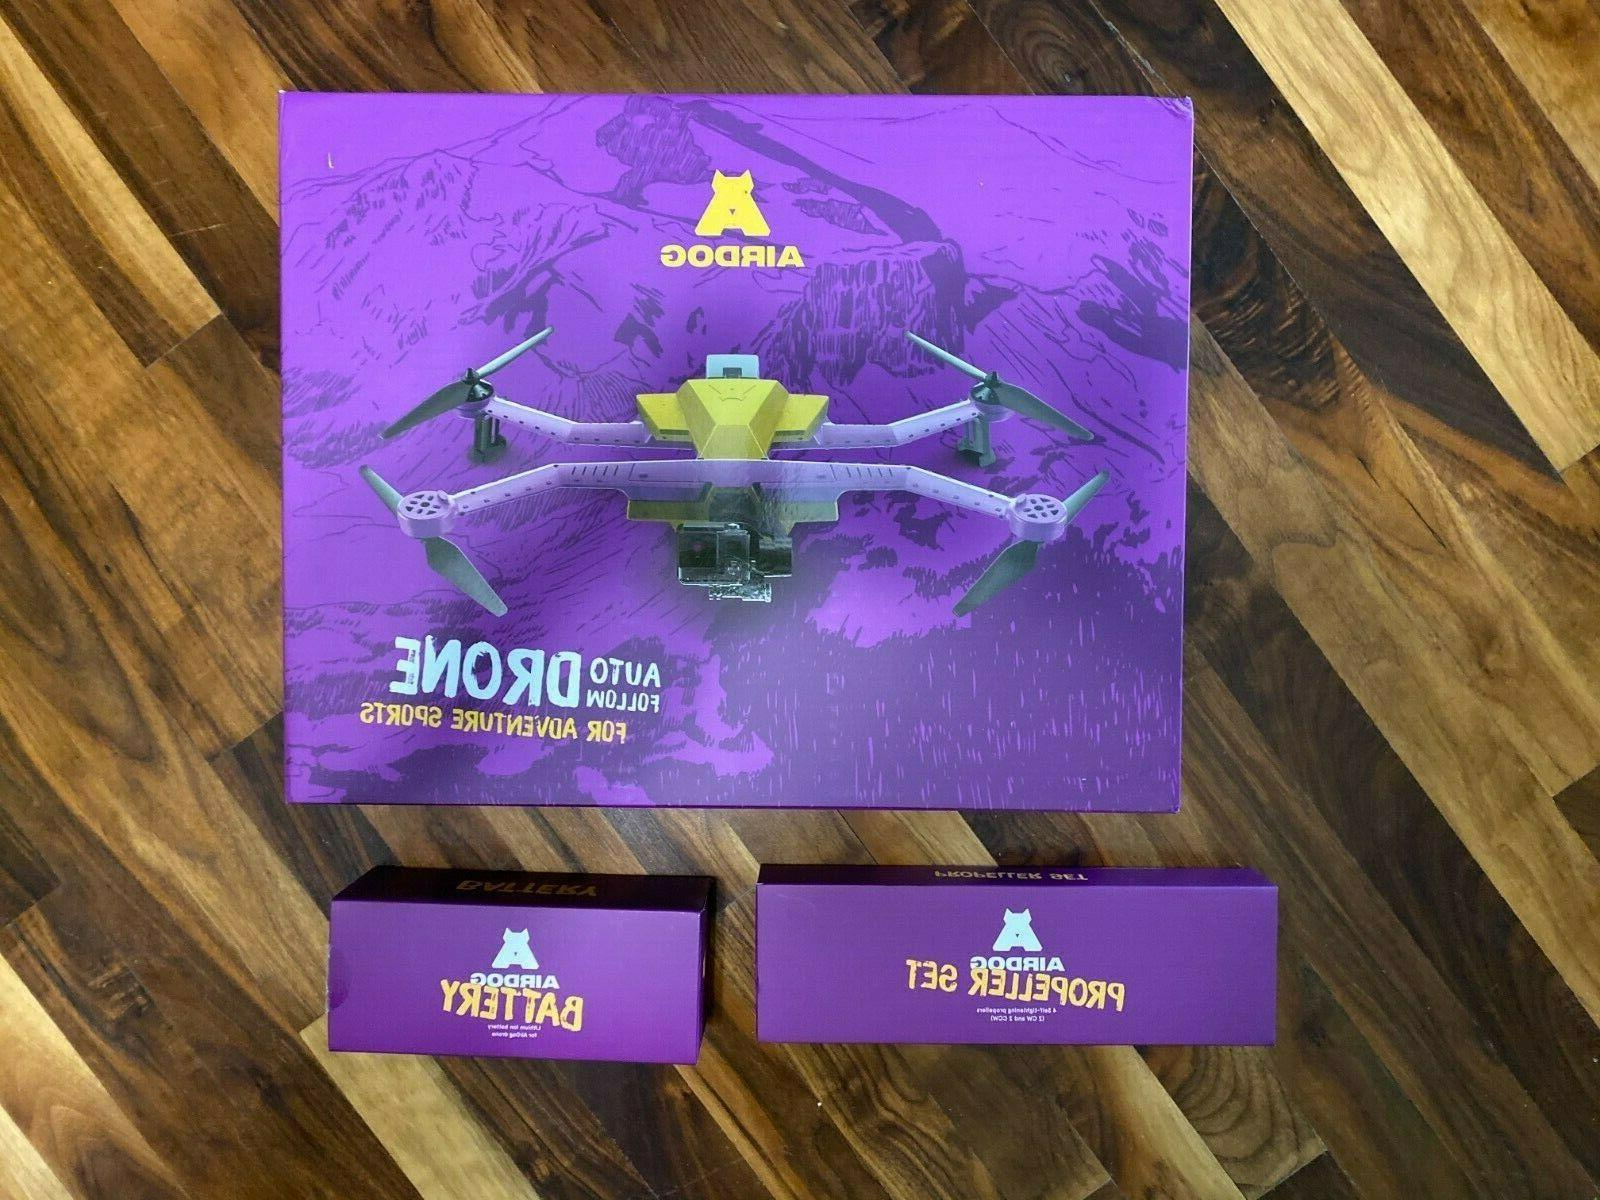 AirDog Auto Follow Sports Drone NEW